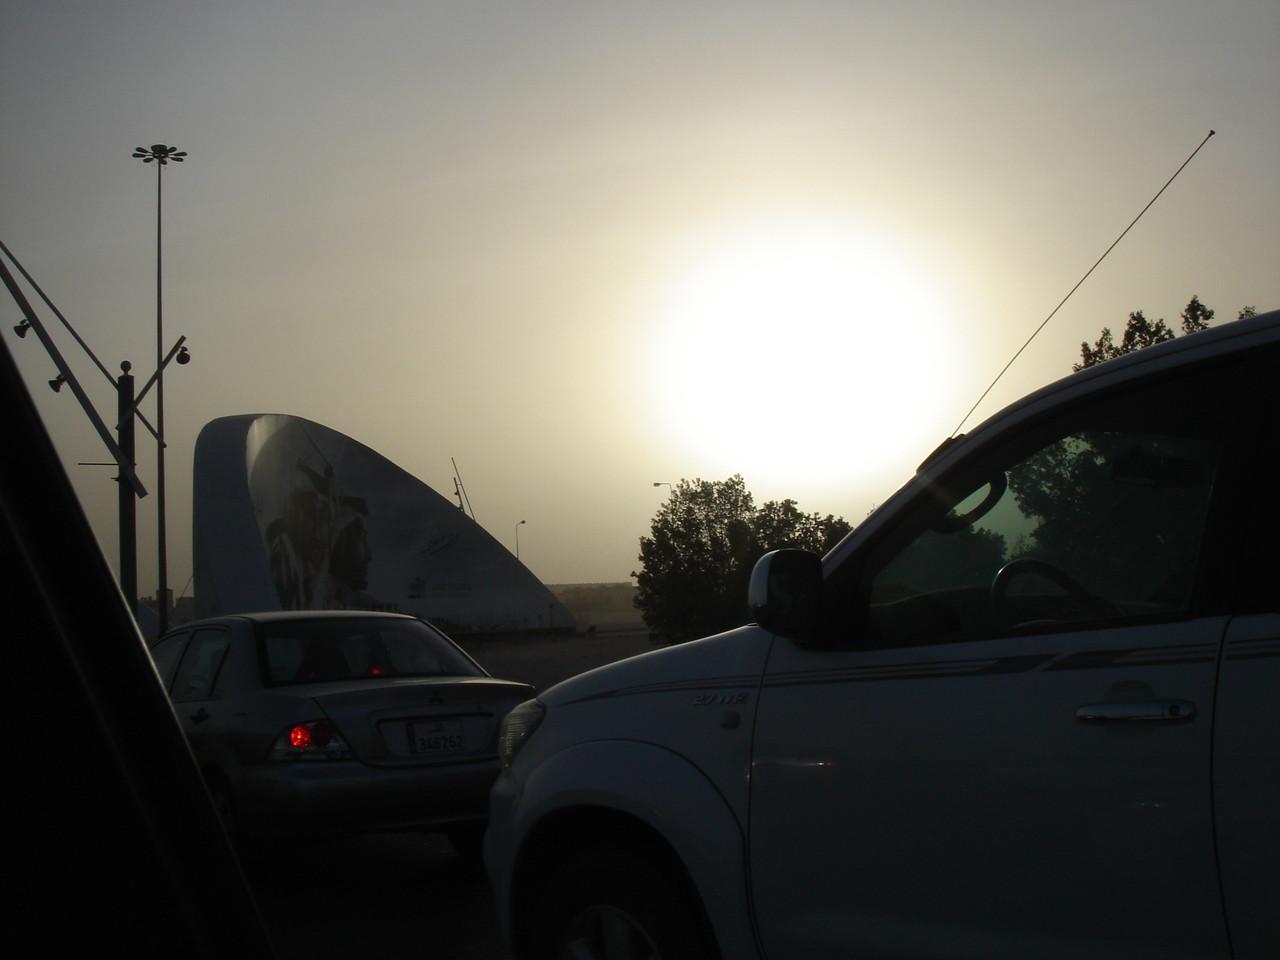 Sandstorm, Qatar